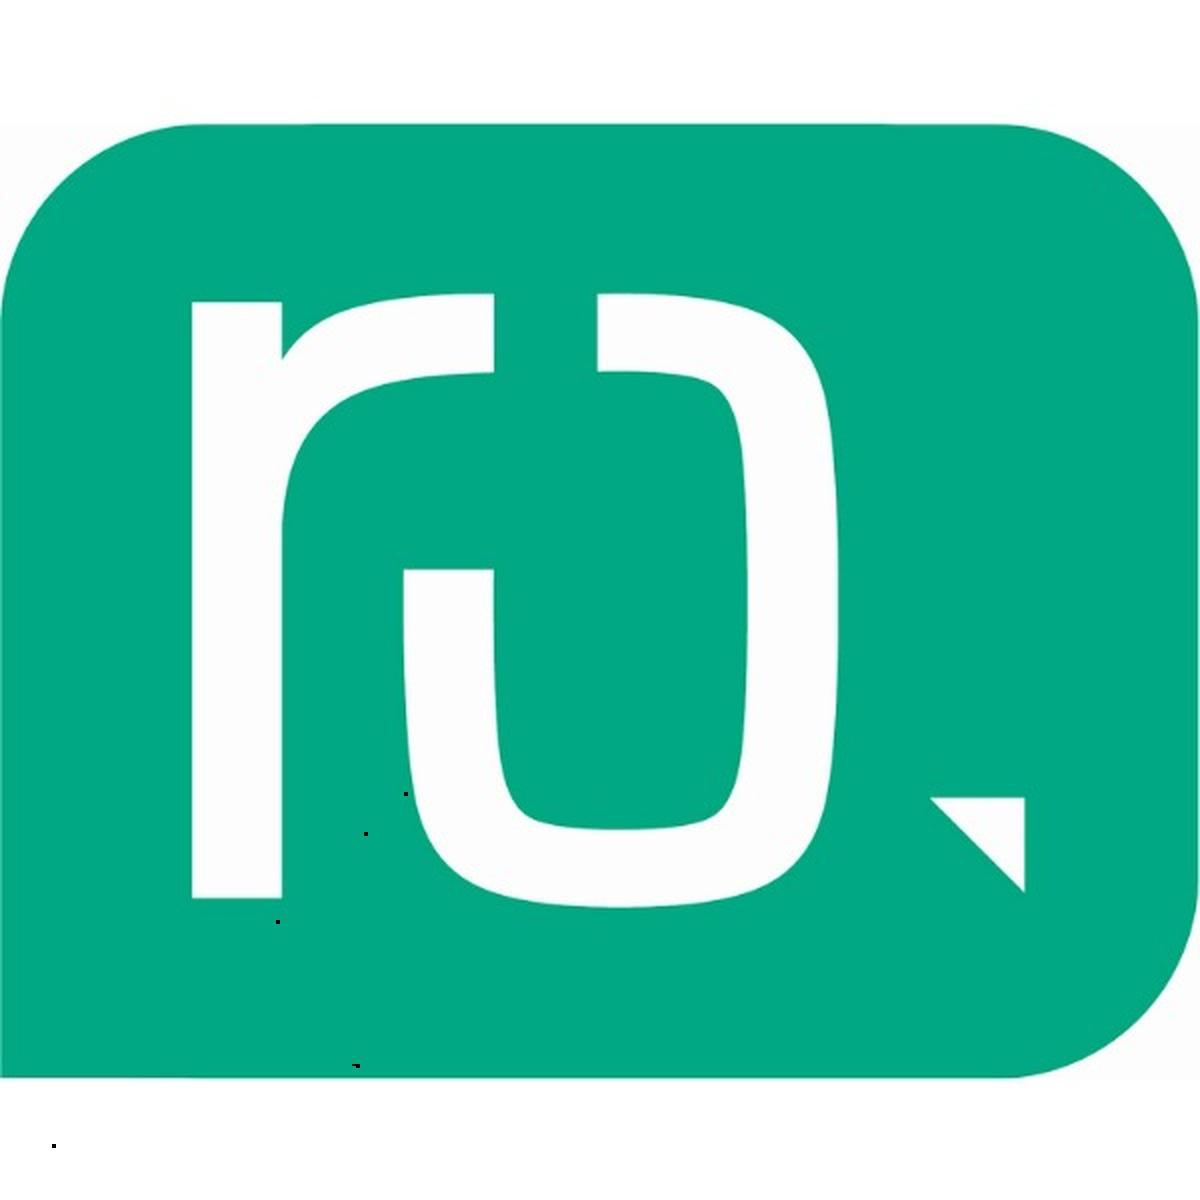 robert obermeyer consulting GmbH